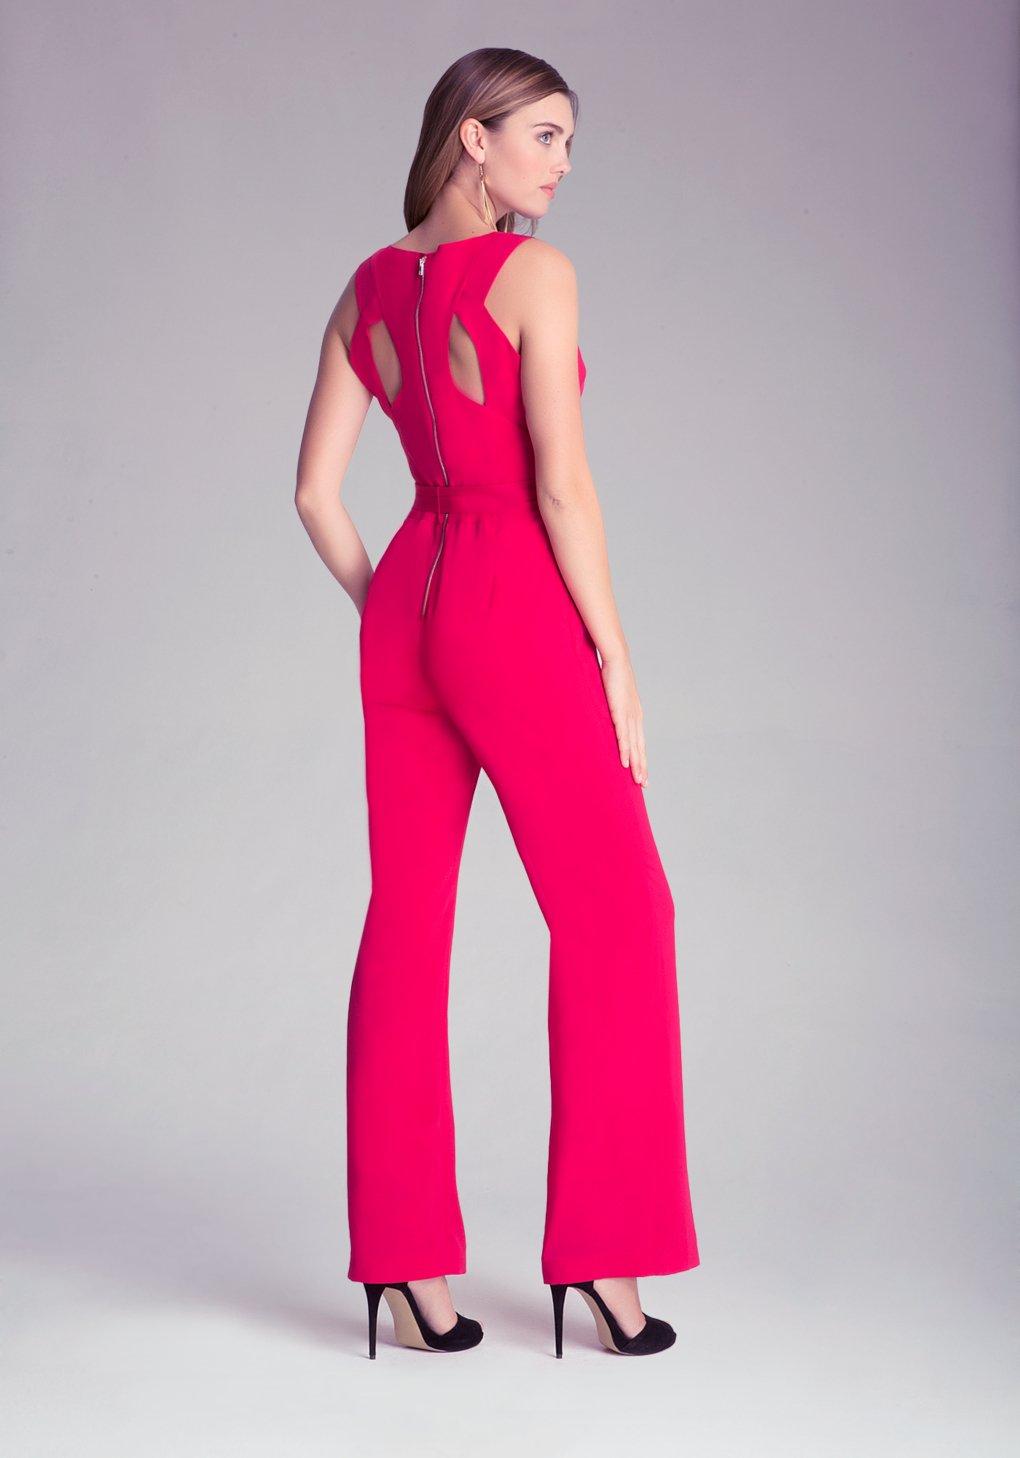 lyst bebe petite kelly jumpsuit in pink. Black Bedroom Furniture Sets. Home Design Ideas